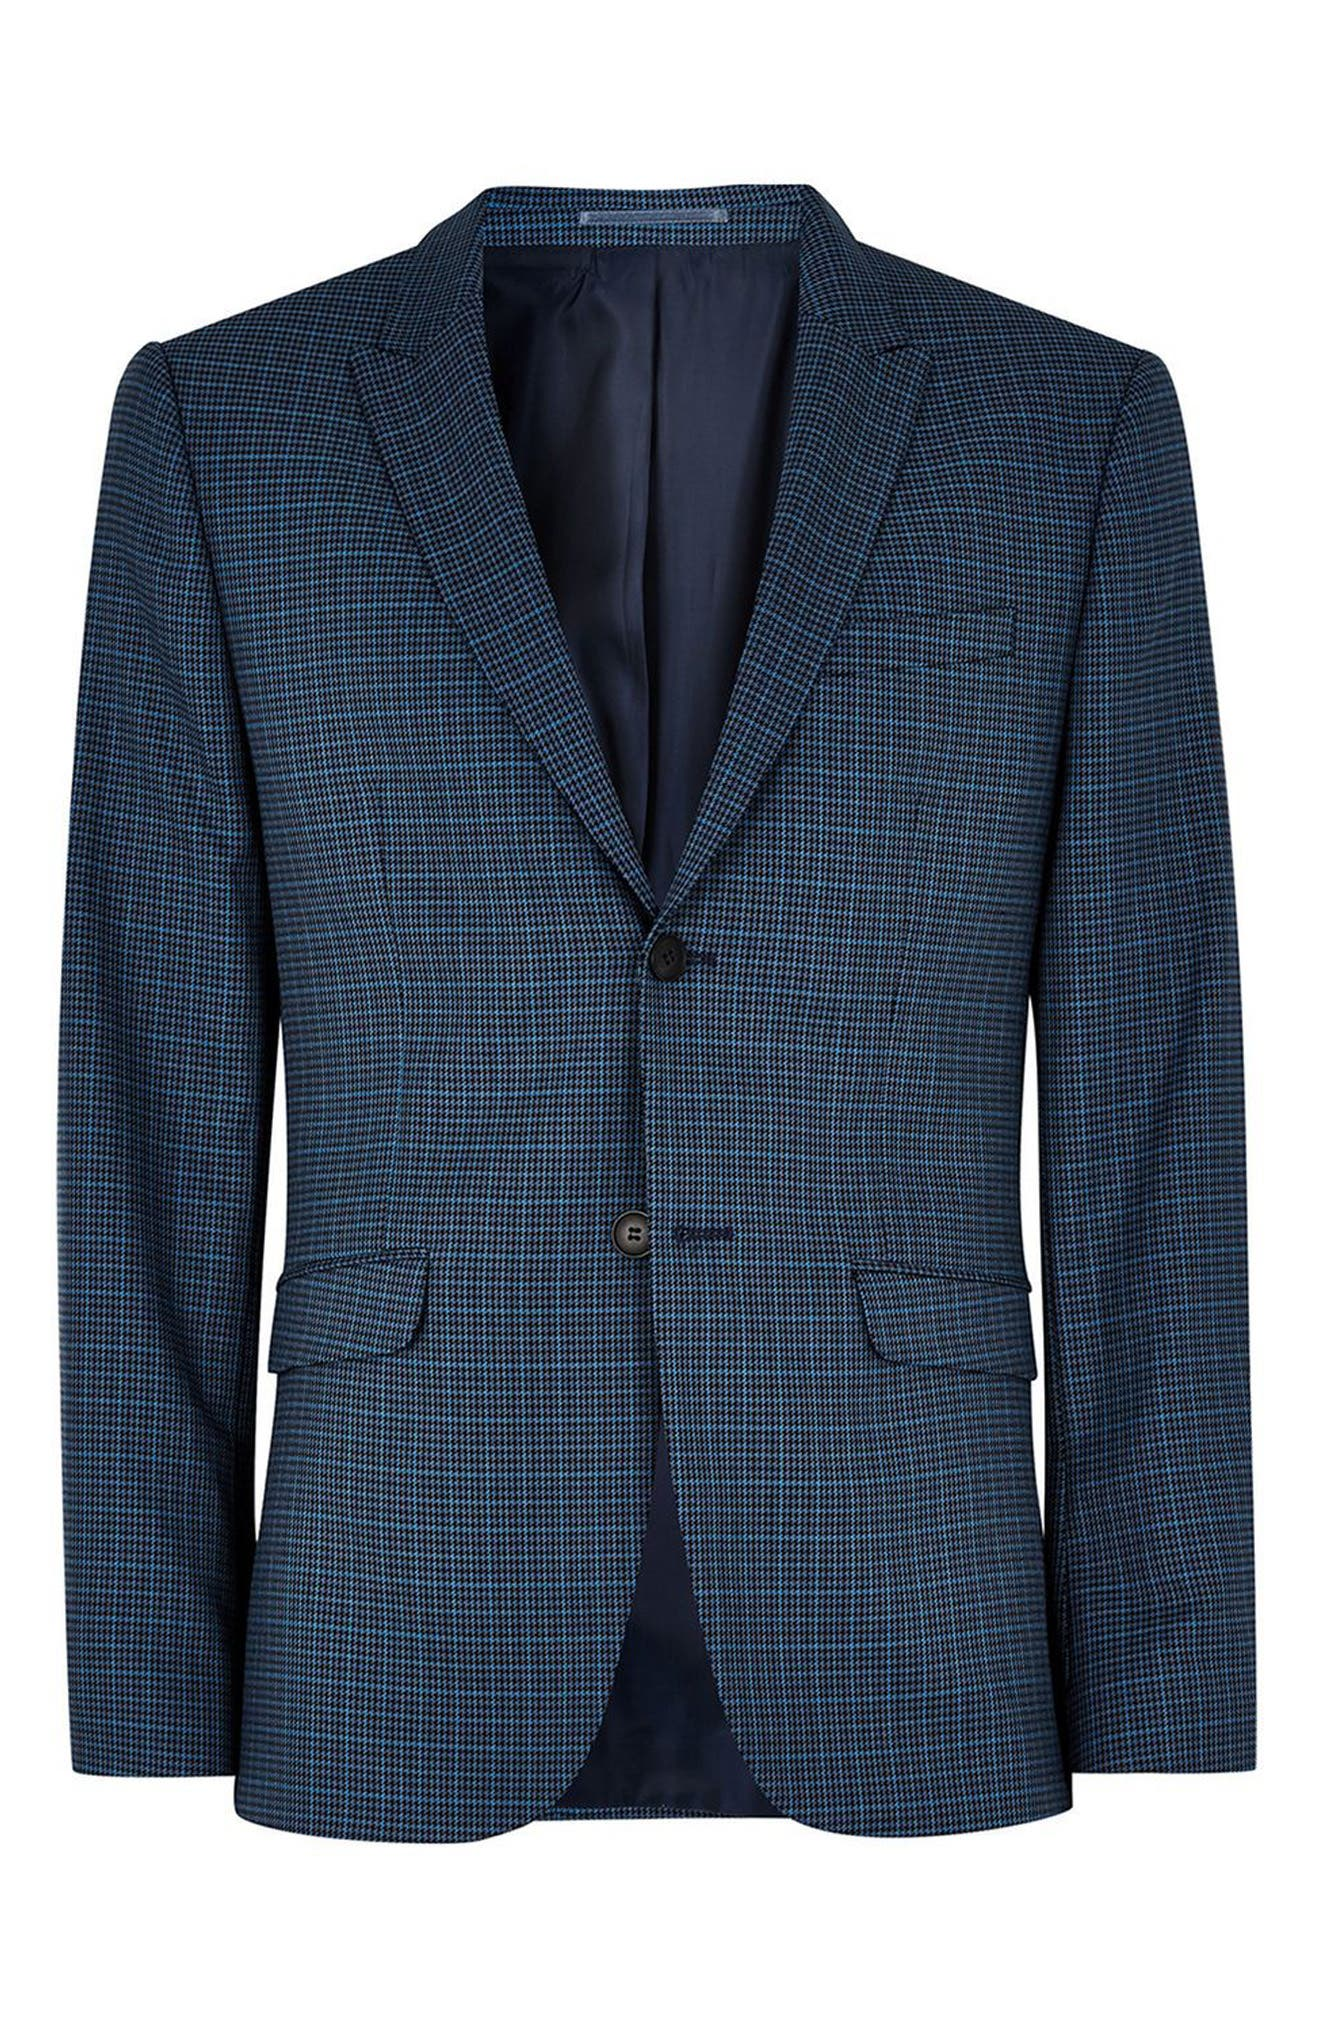 Alternate Image 4  - Topman Check Skinny Fit Suit Jacket